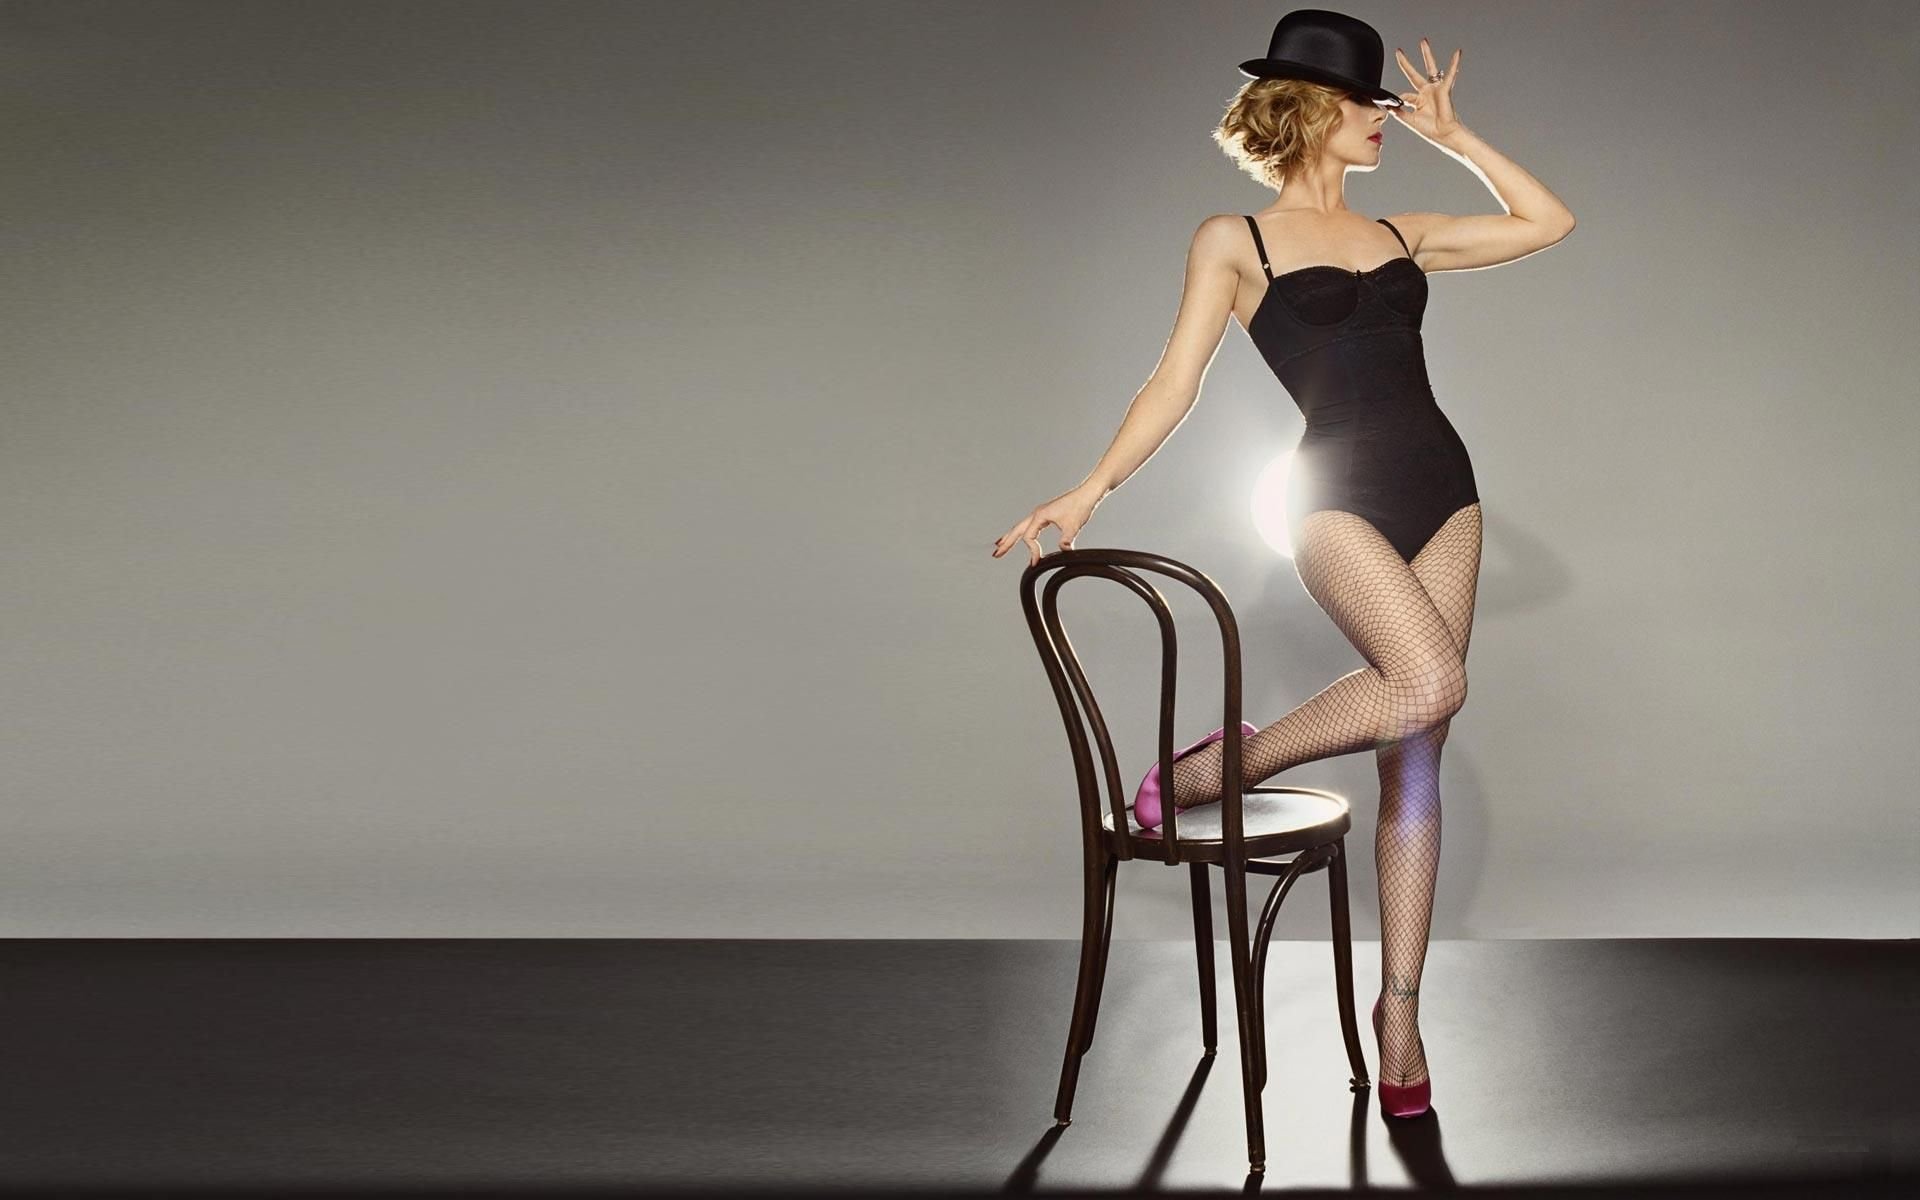 Christina Applegate Bob Fosse Pose Dance Picture Poses Dance